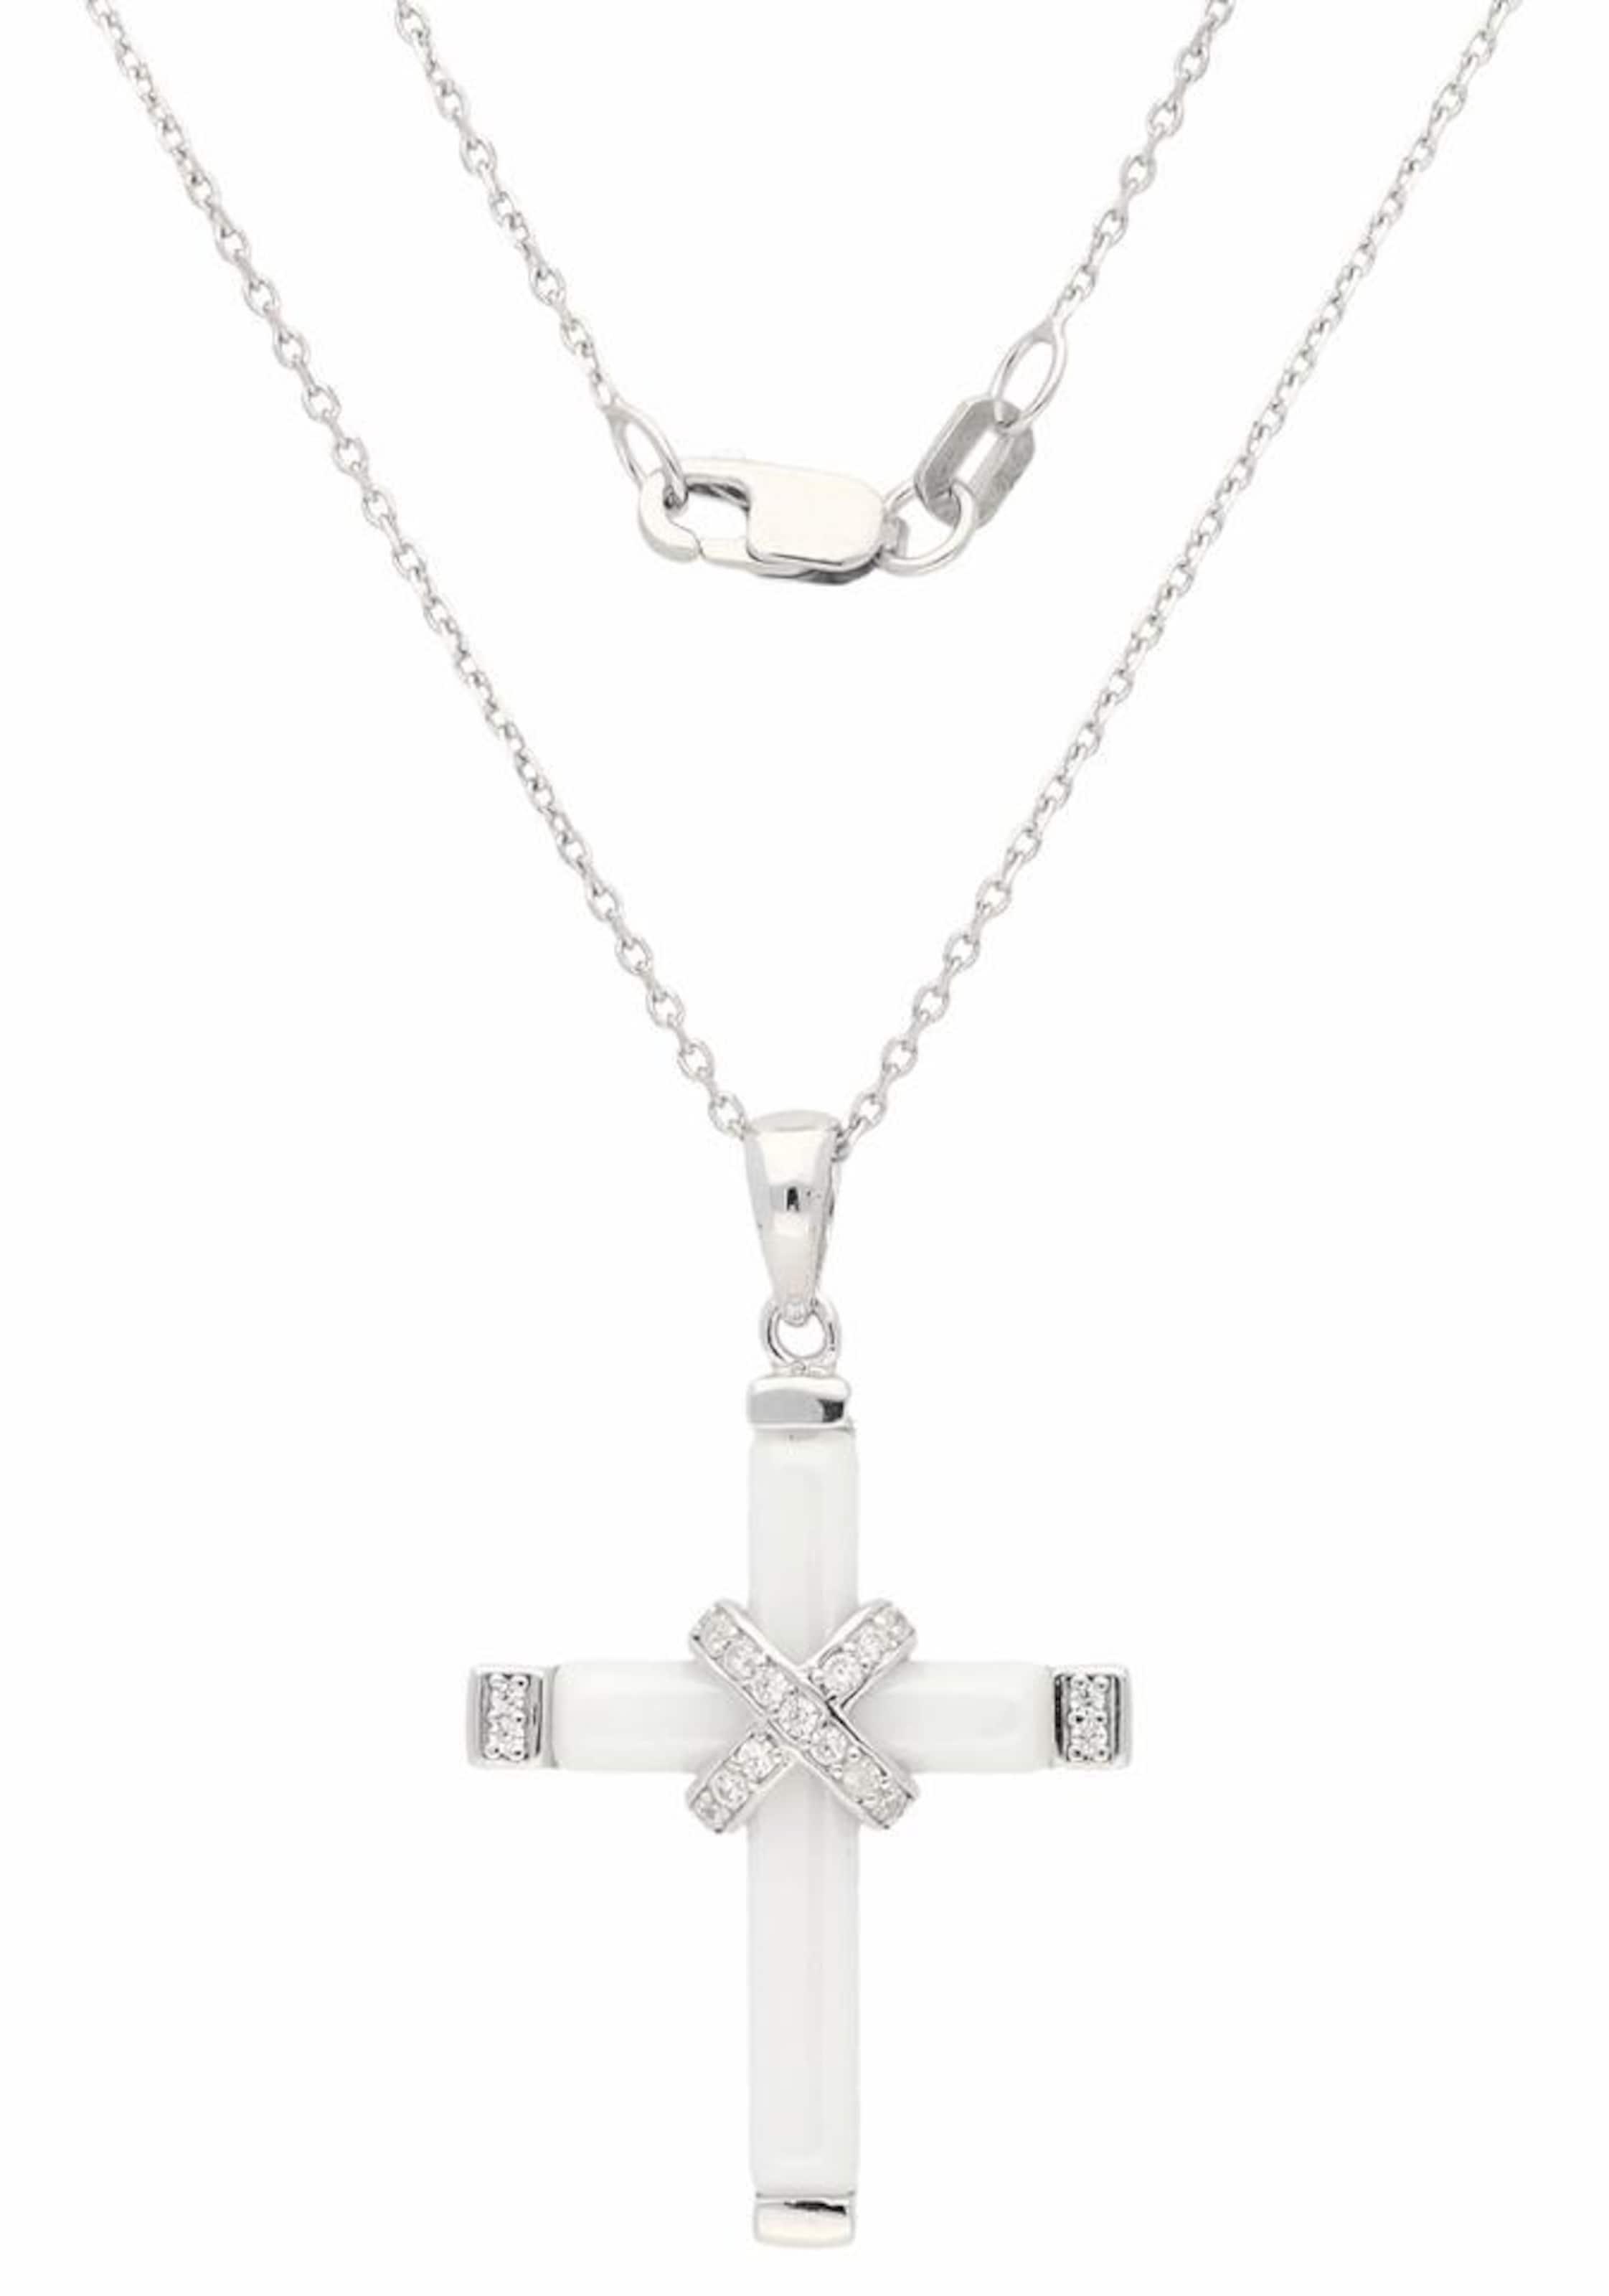 FIRETTI Kreuzkette Gutes Verkauf Günstiger Preis IB5gsUuH3